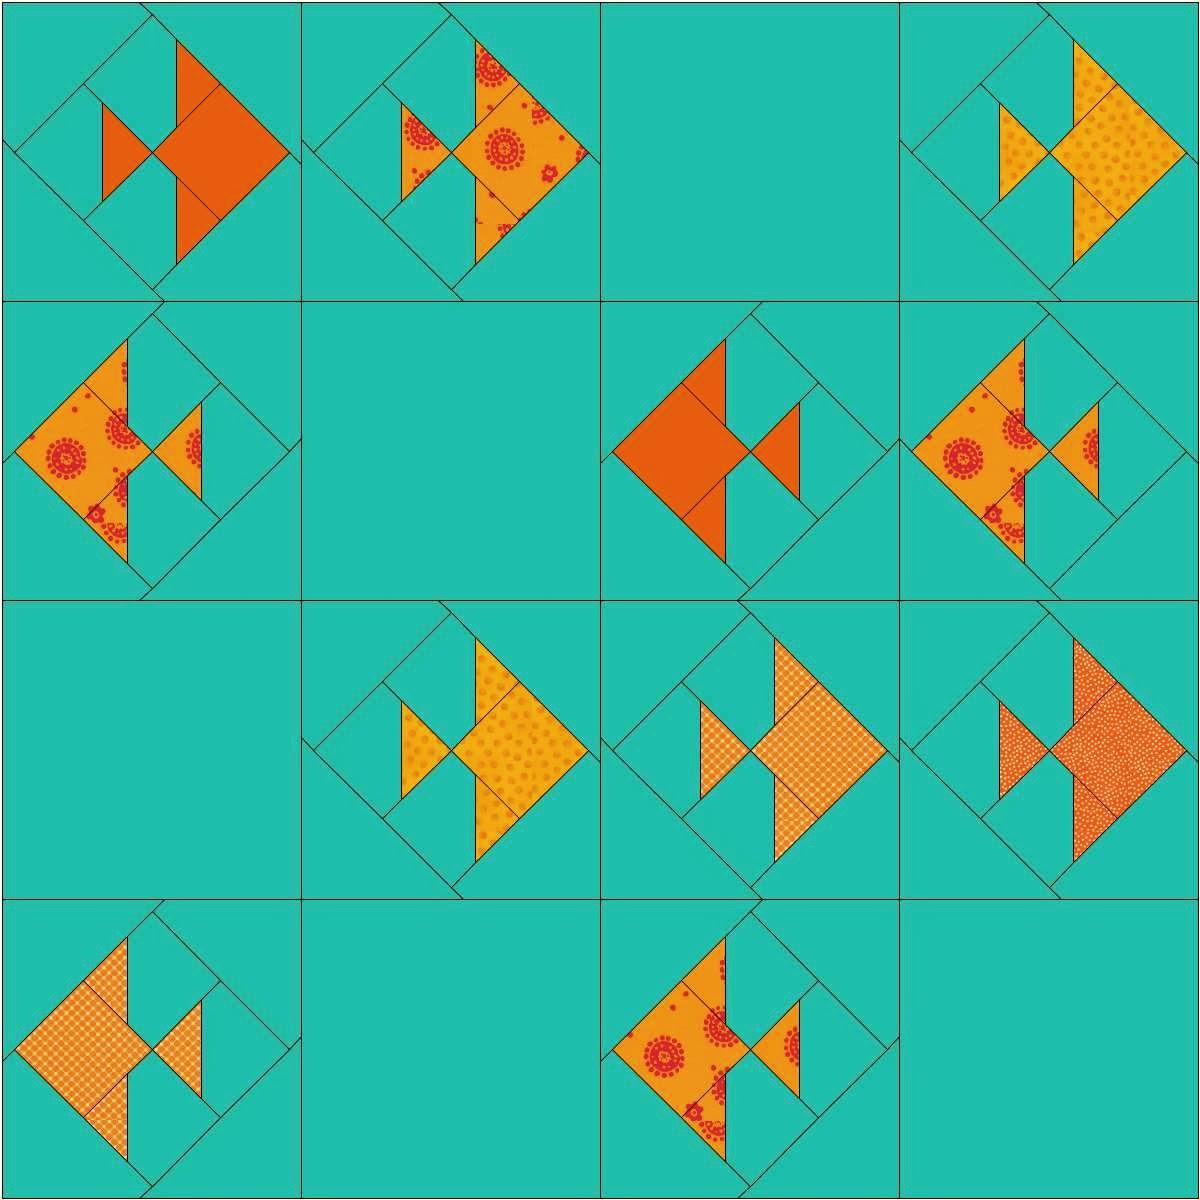 Emerald Coast Modern Quilt Guild: March 2014 Block Lottery - Gold ... : fish quilt block - Adamdwight.com